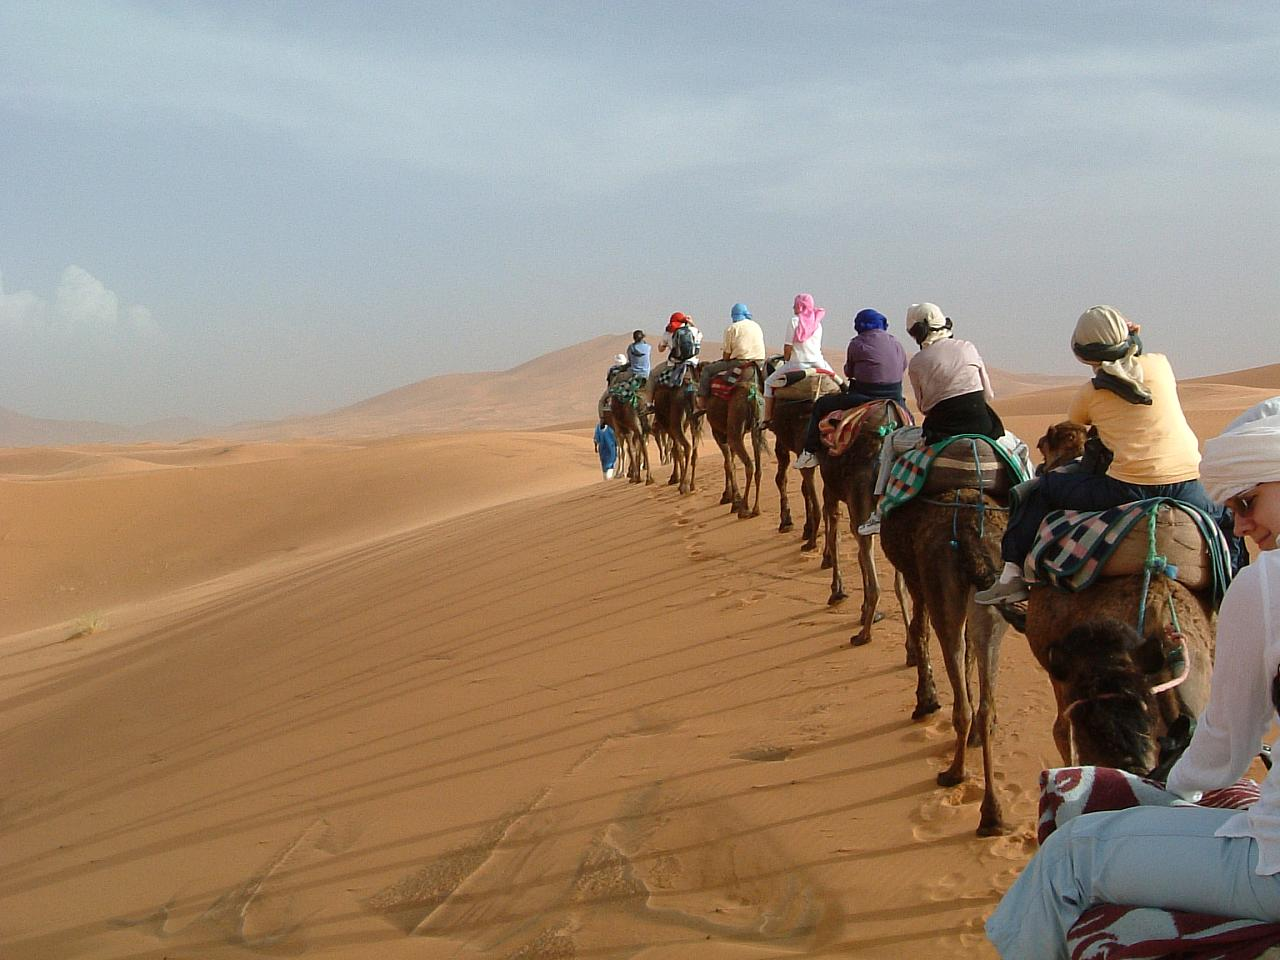 Camel riding in Morocco's Sahara desert